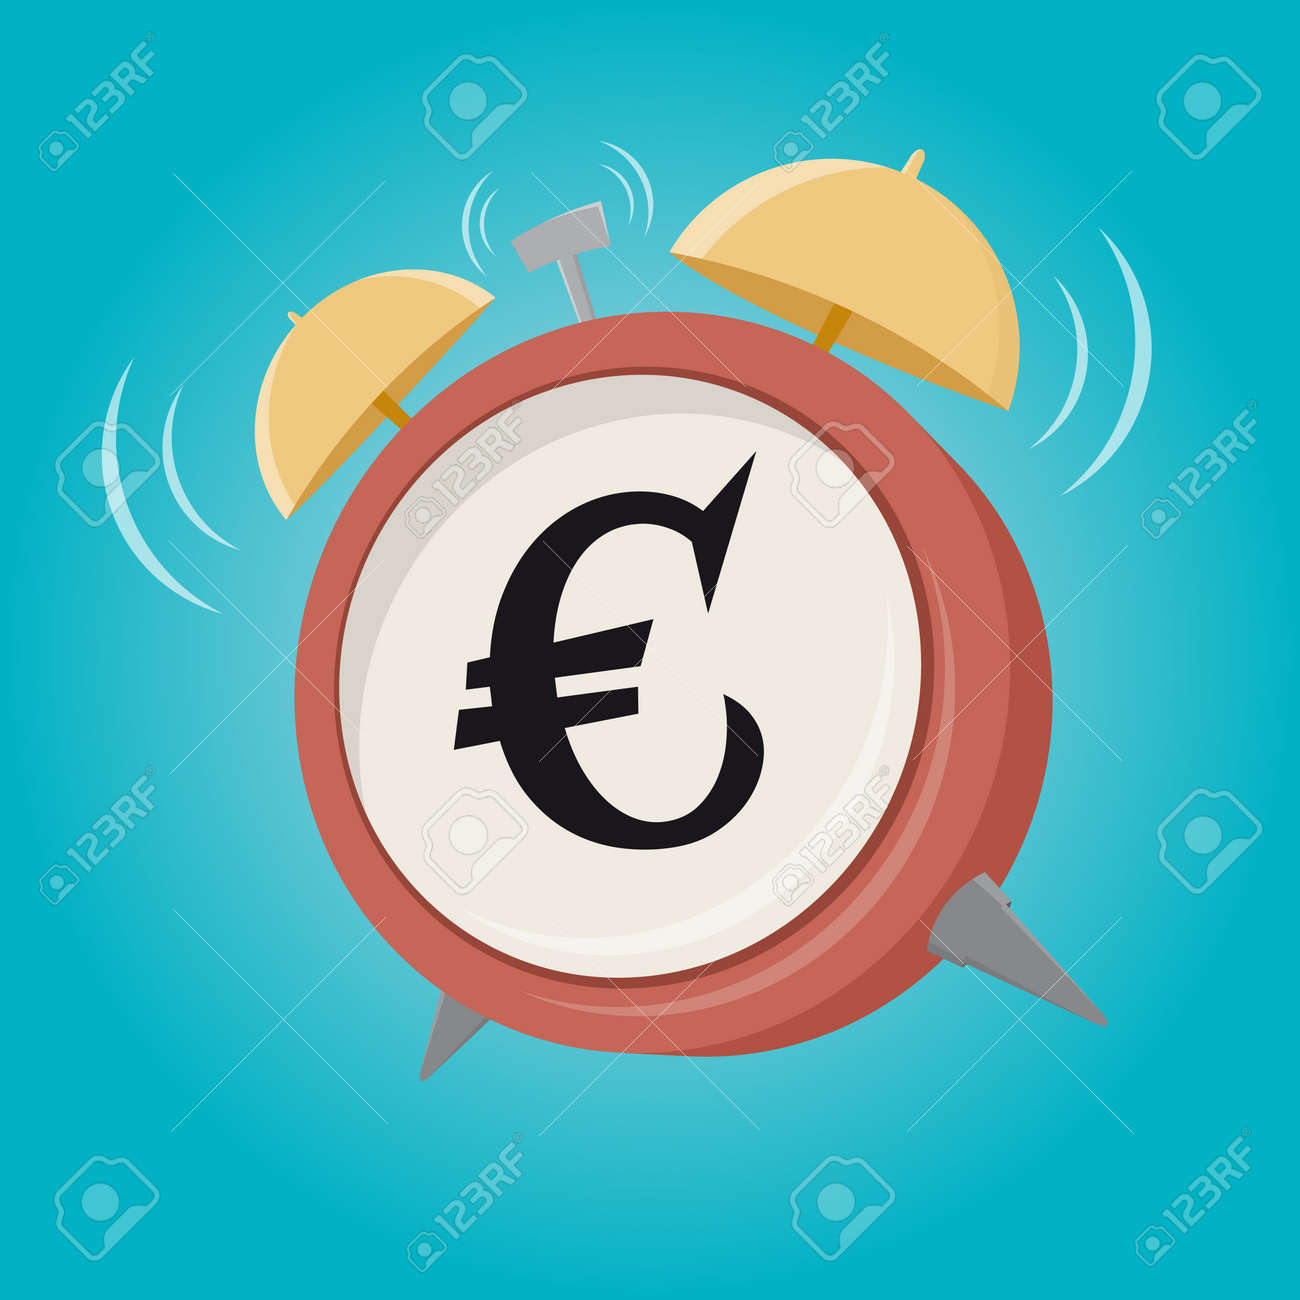 Euro Sign Cartoon Alarm Clock Royalty Free Cliparts Vectors And